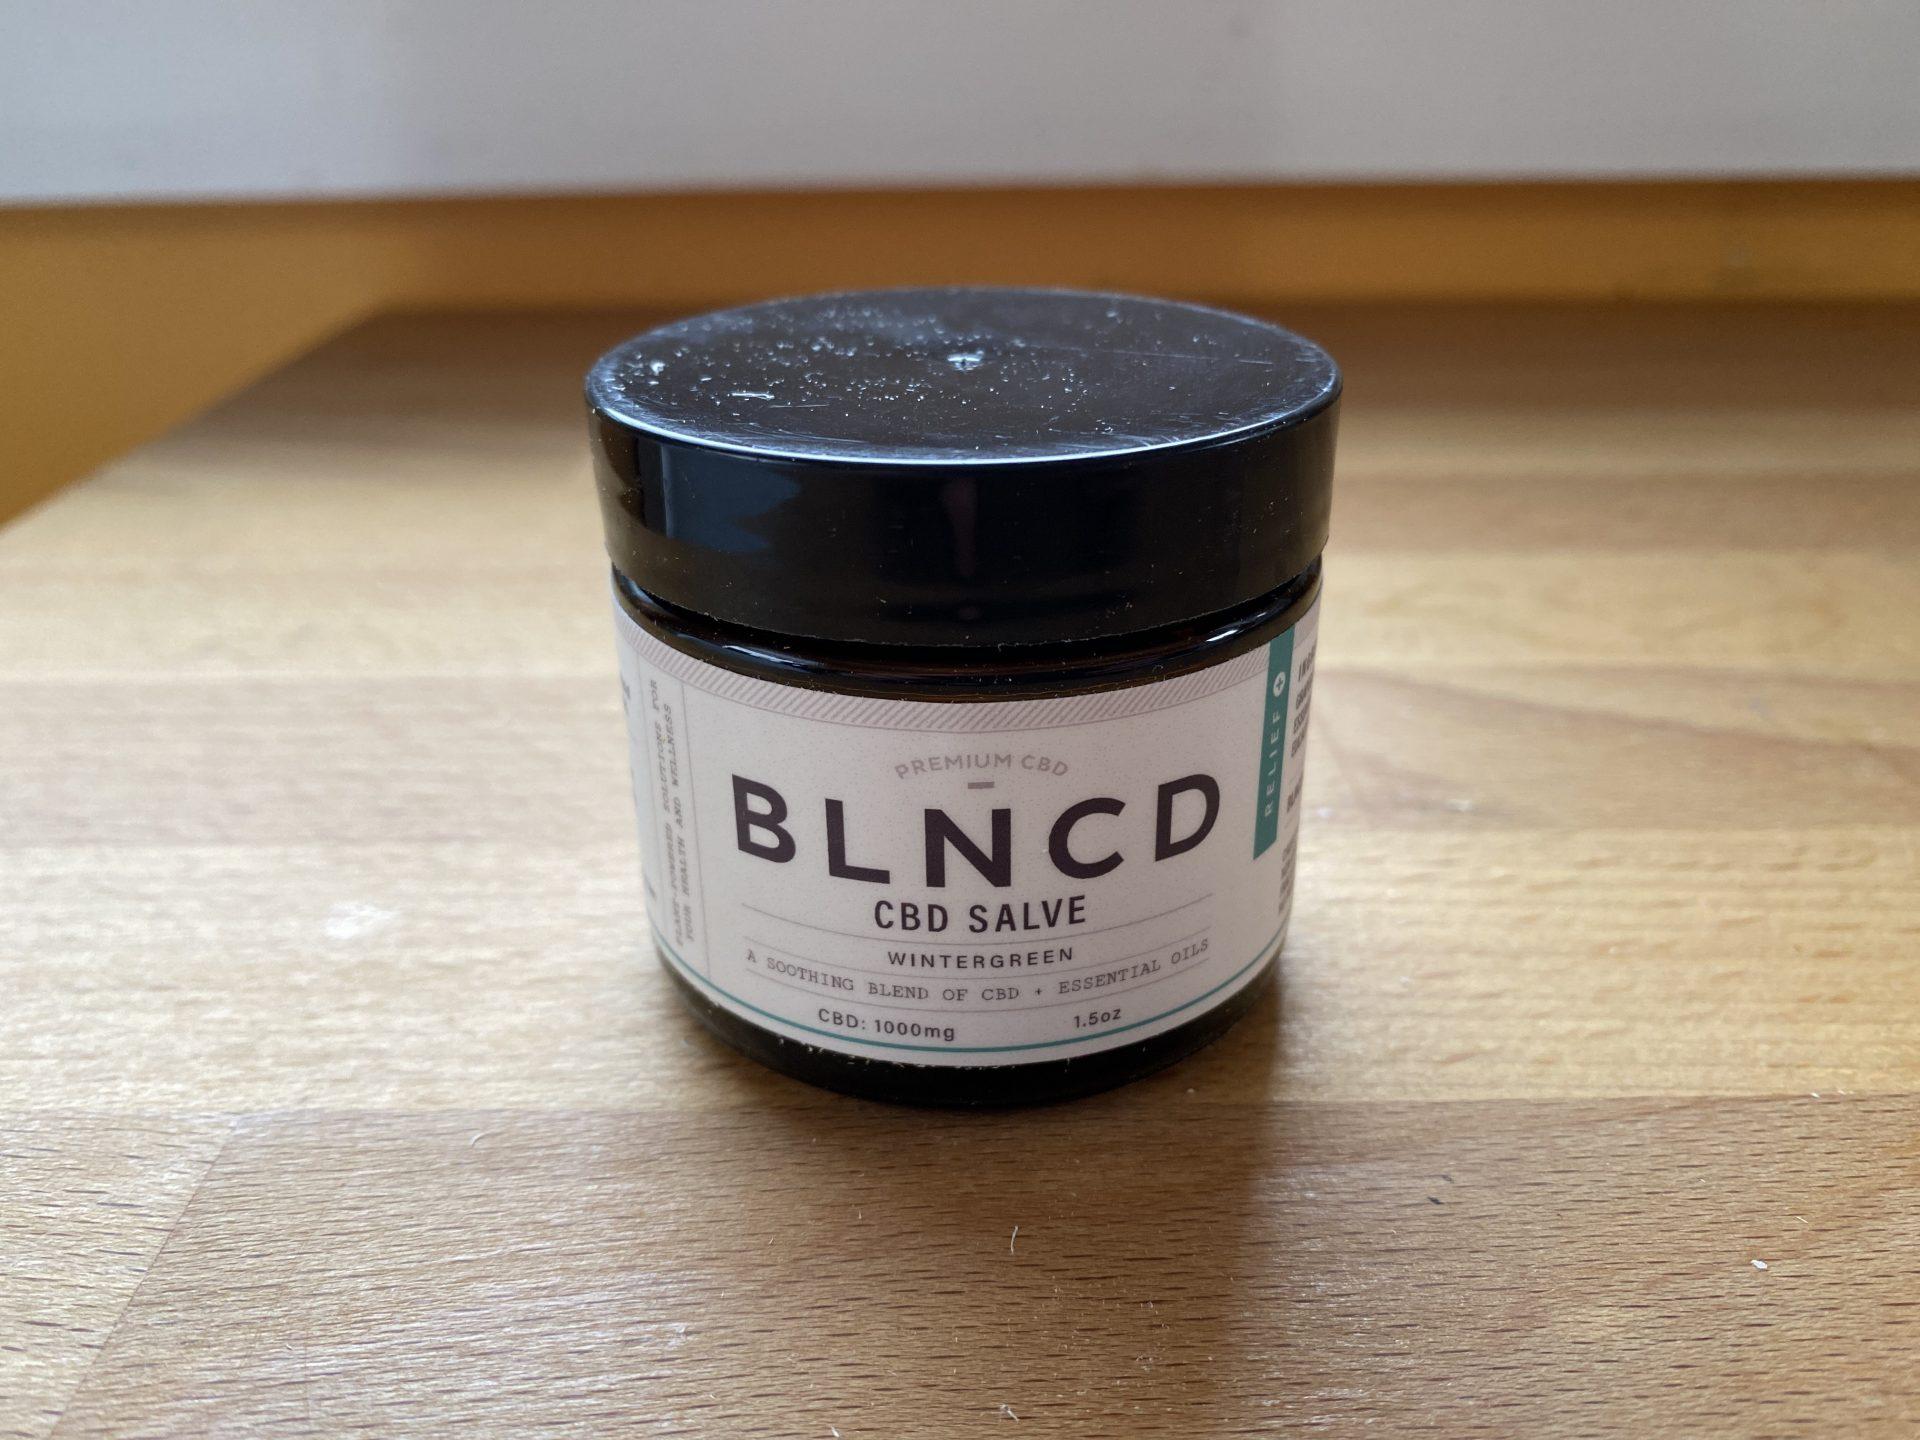 CBD BLNCD